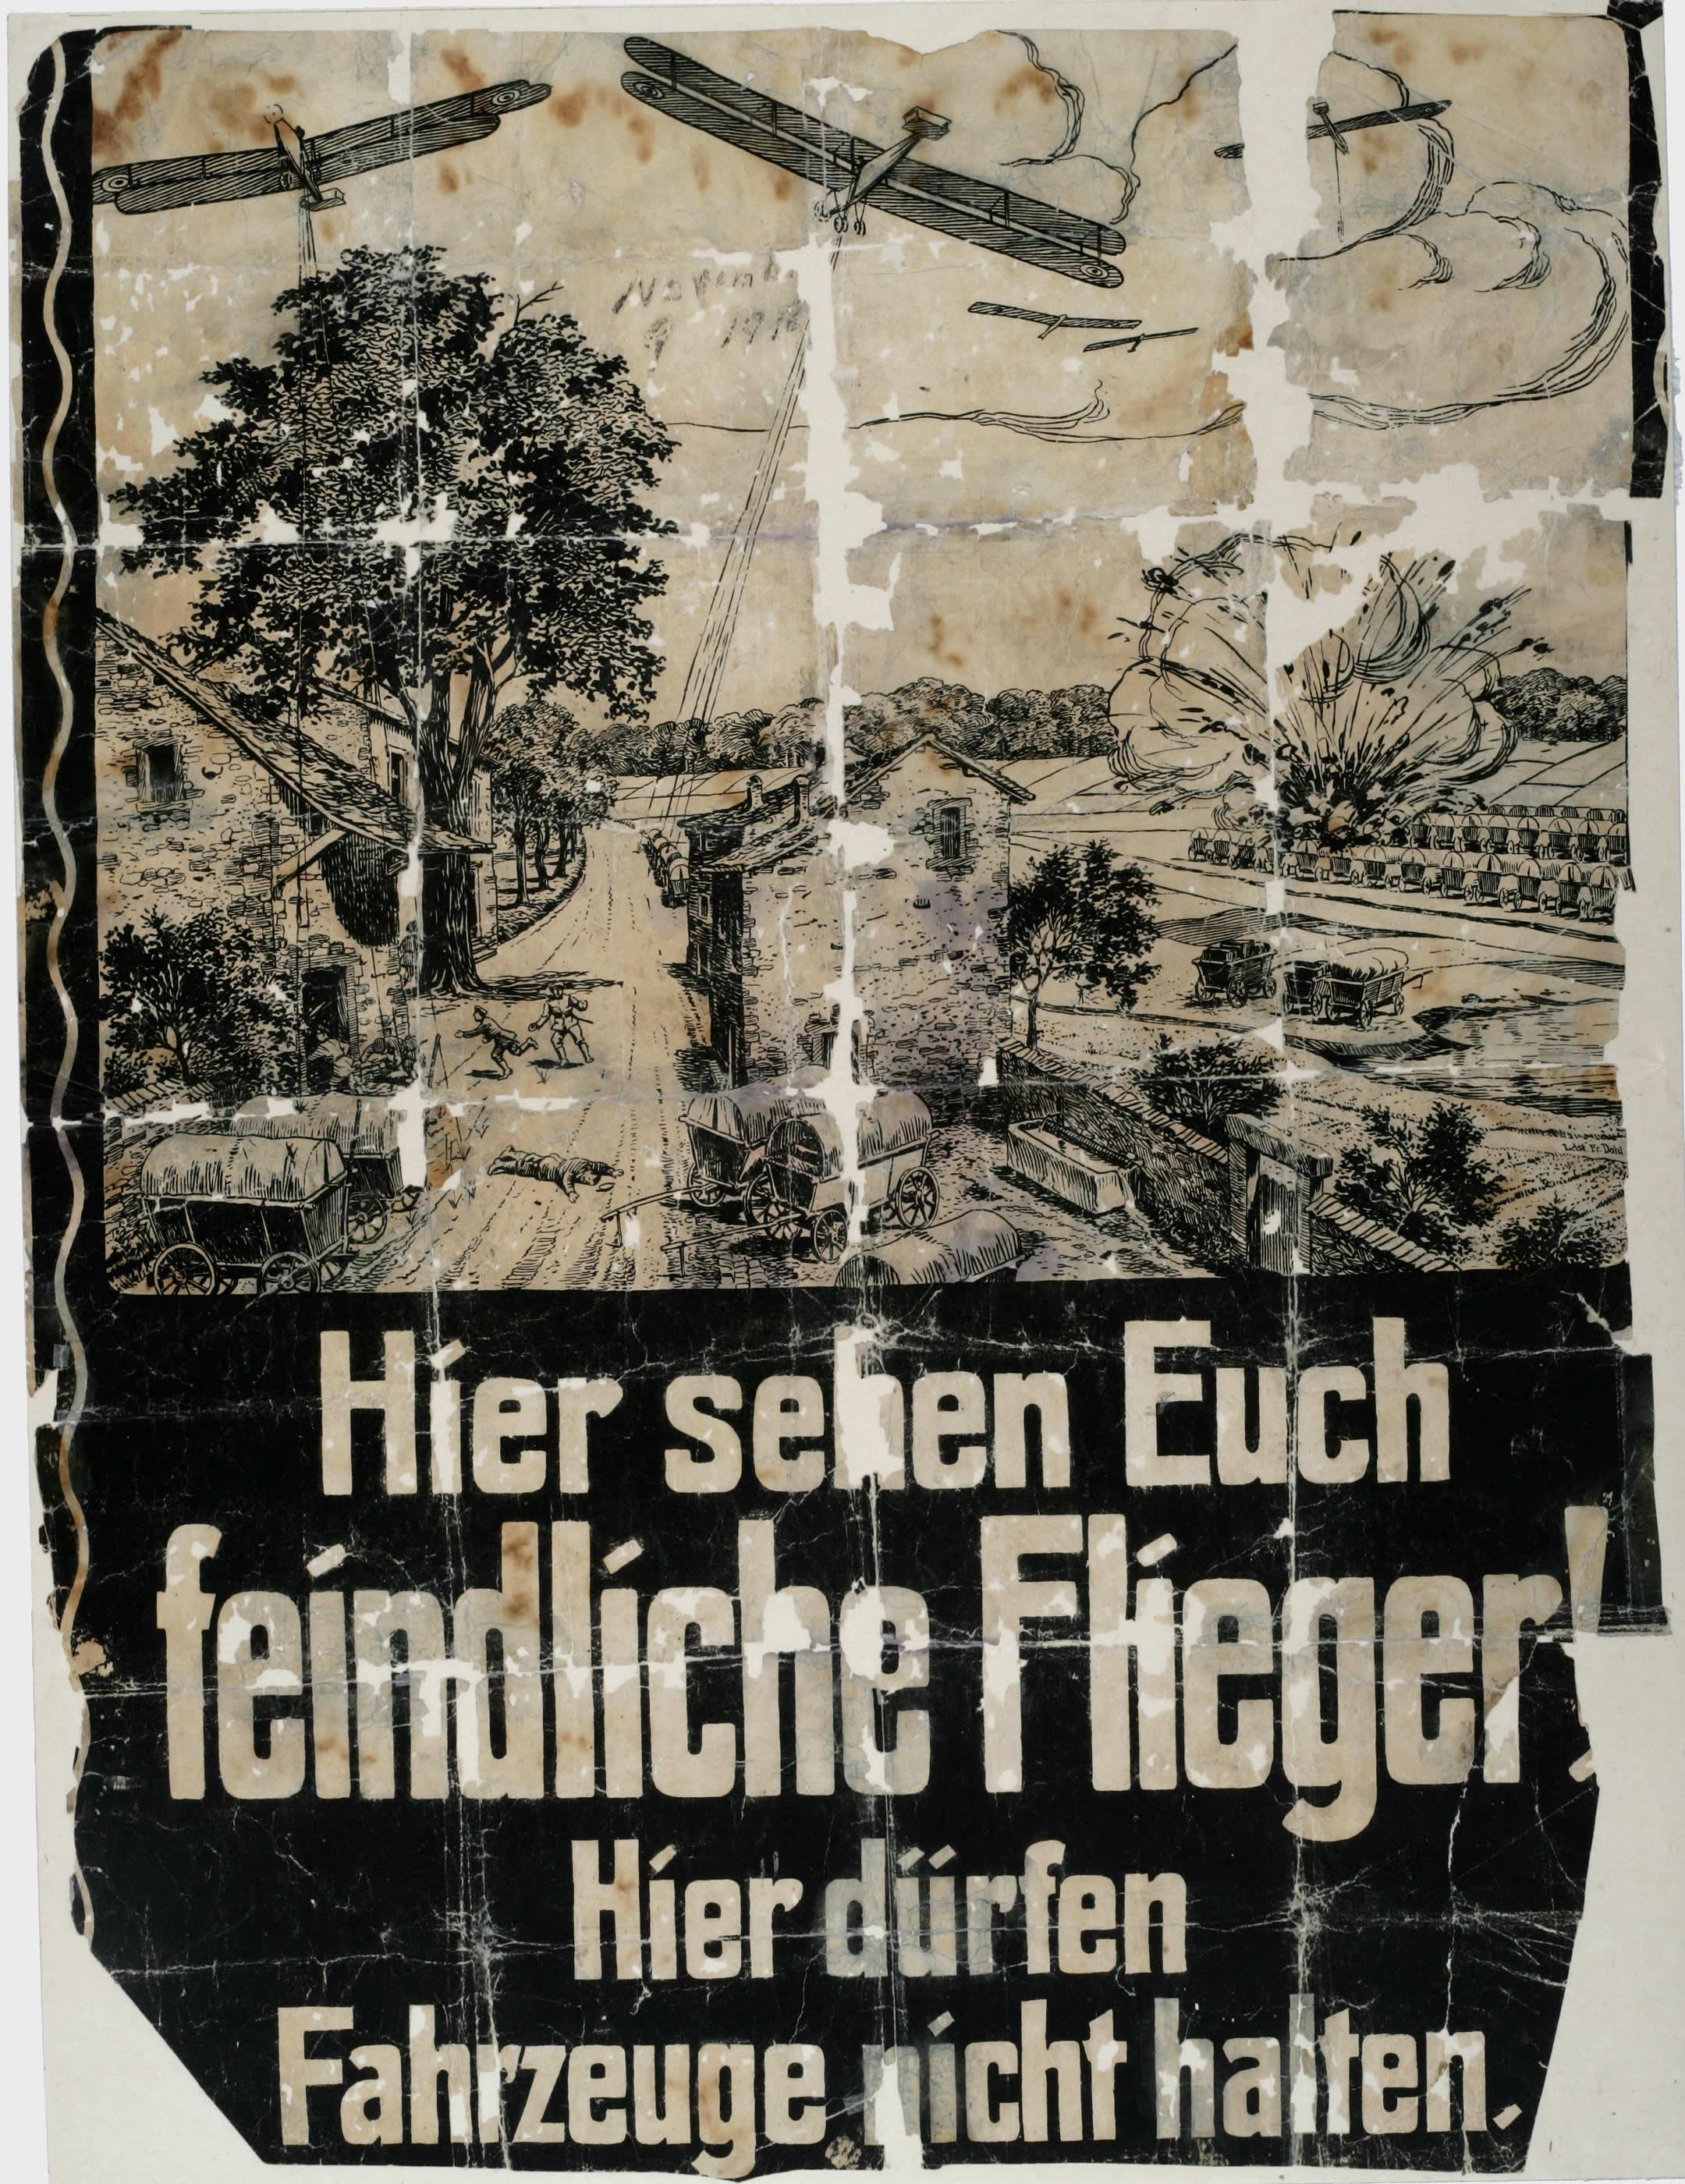 German Air Raid Information Poster